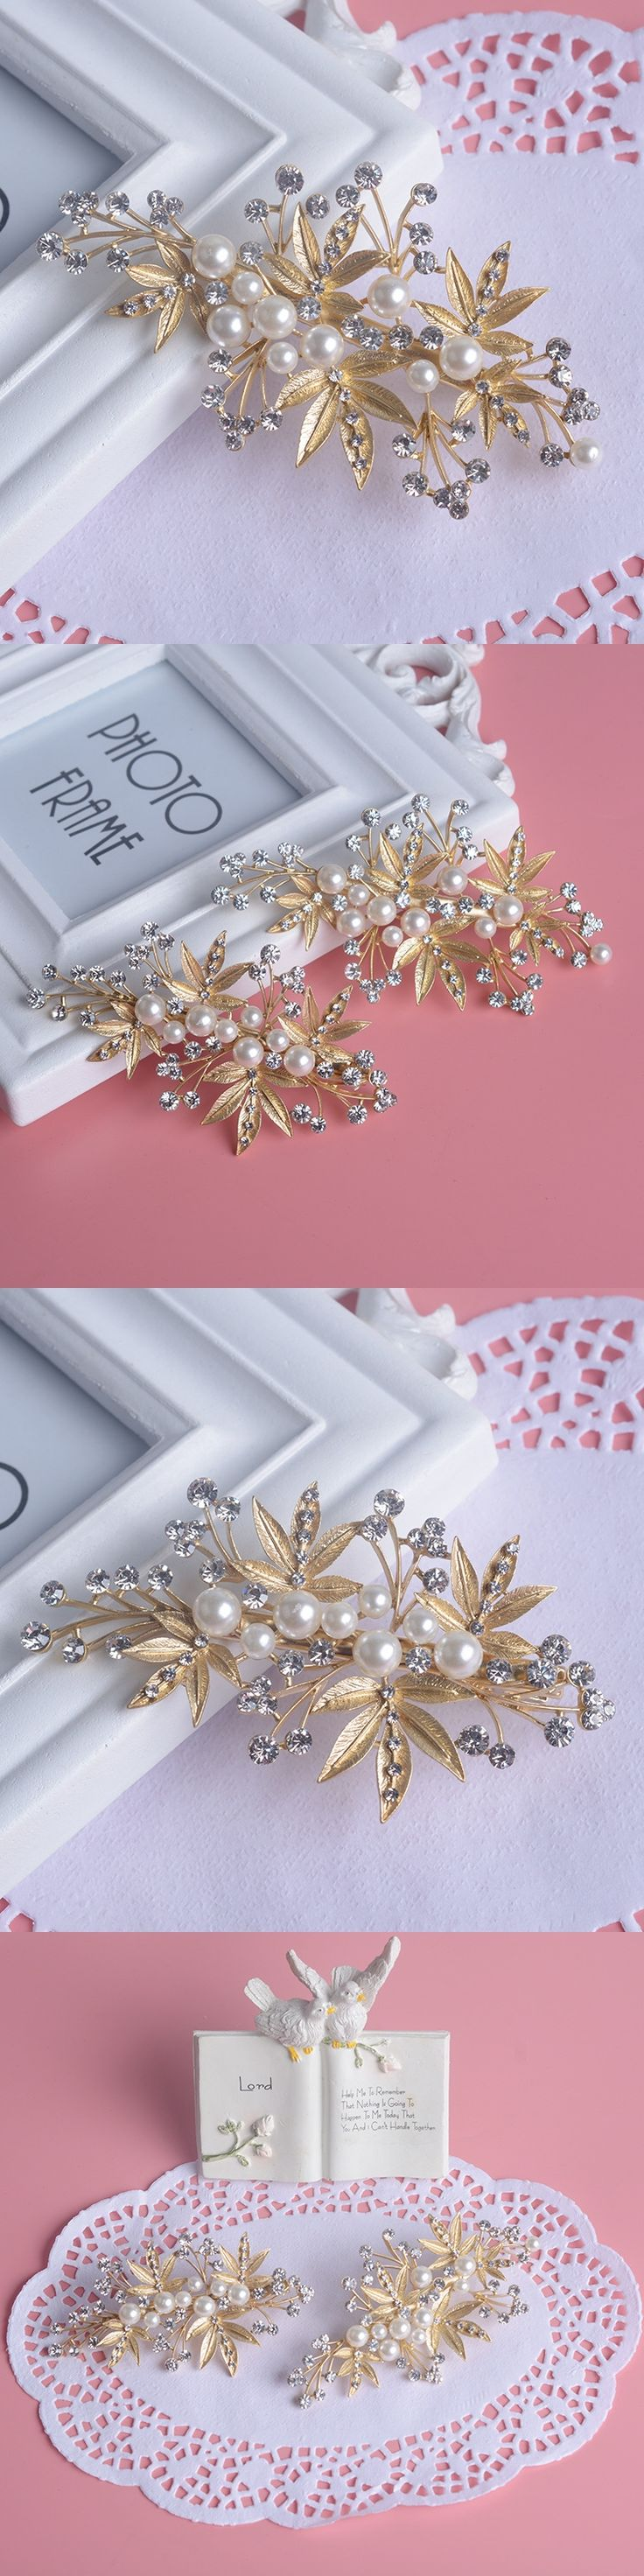 Korean Bride Crystal Jewelry Pearl Leaf Headwear Dumb Golden Corolla Hairpin Princess Bridal Hairclips Wedding Hair Accessories